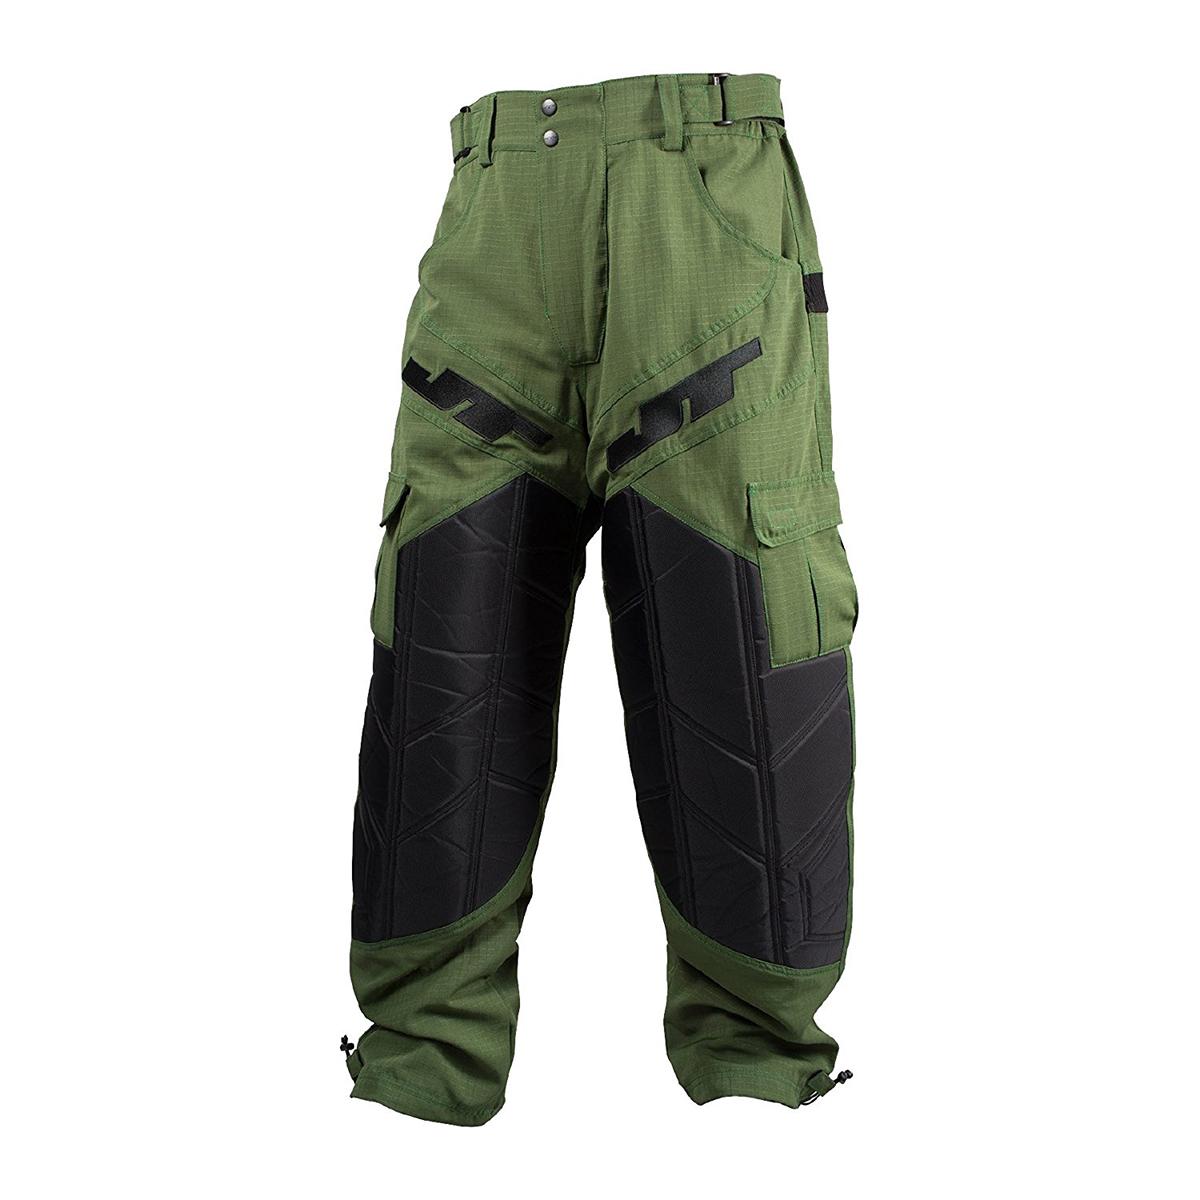 JT Paintball Pants - Cargo - OD Green